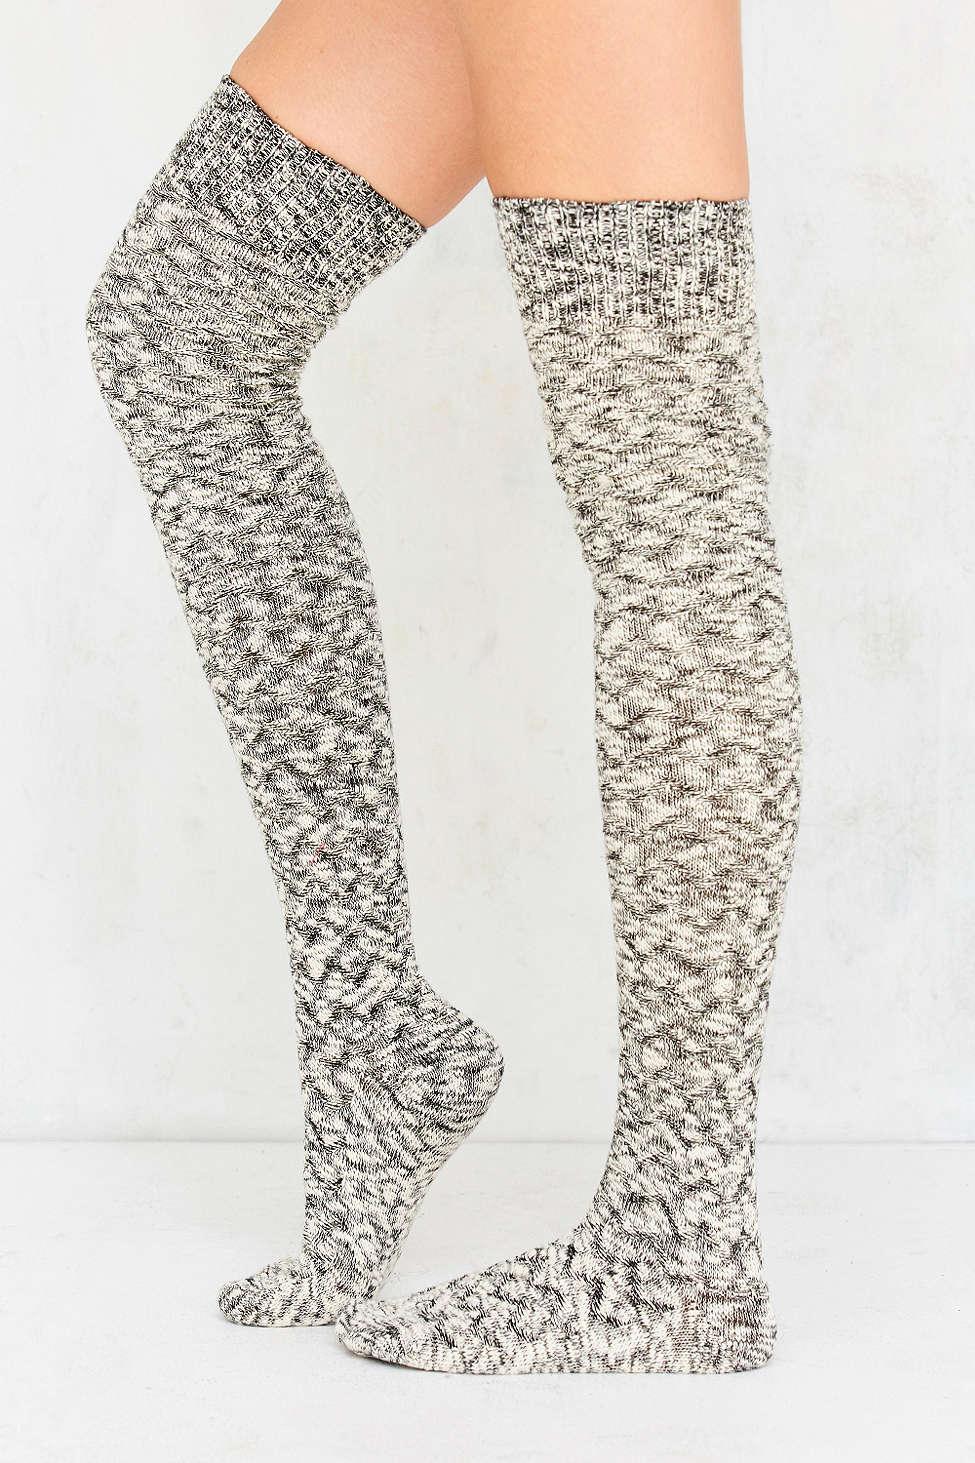 Socks-Urban-Outfitters.jpg